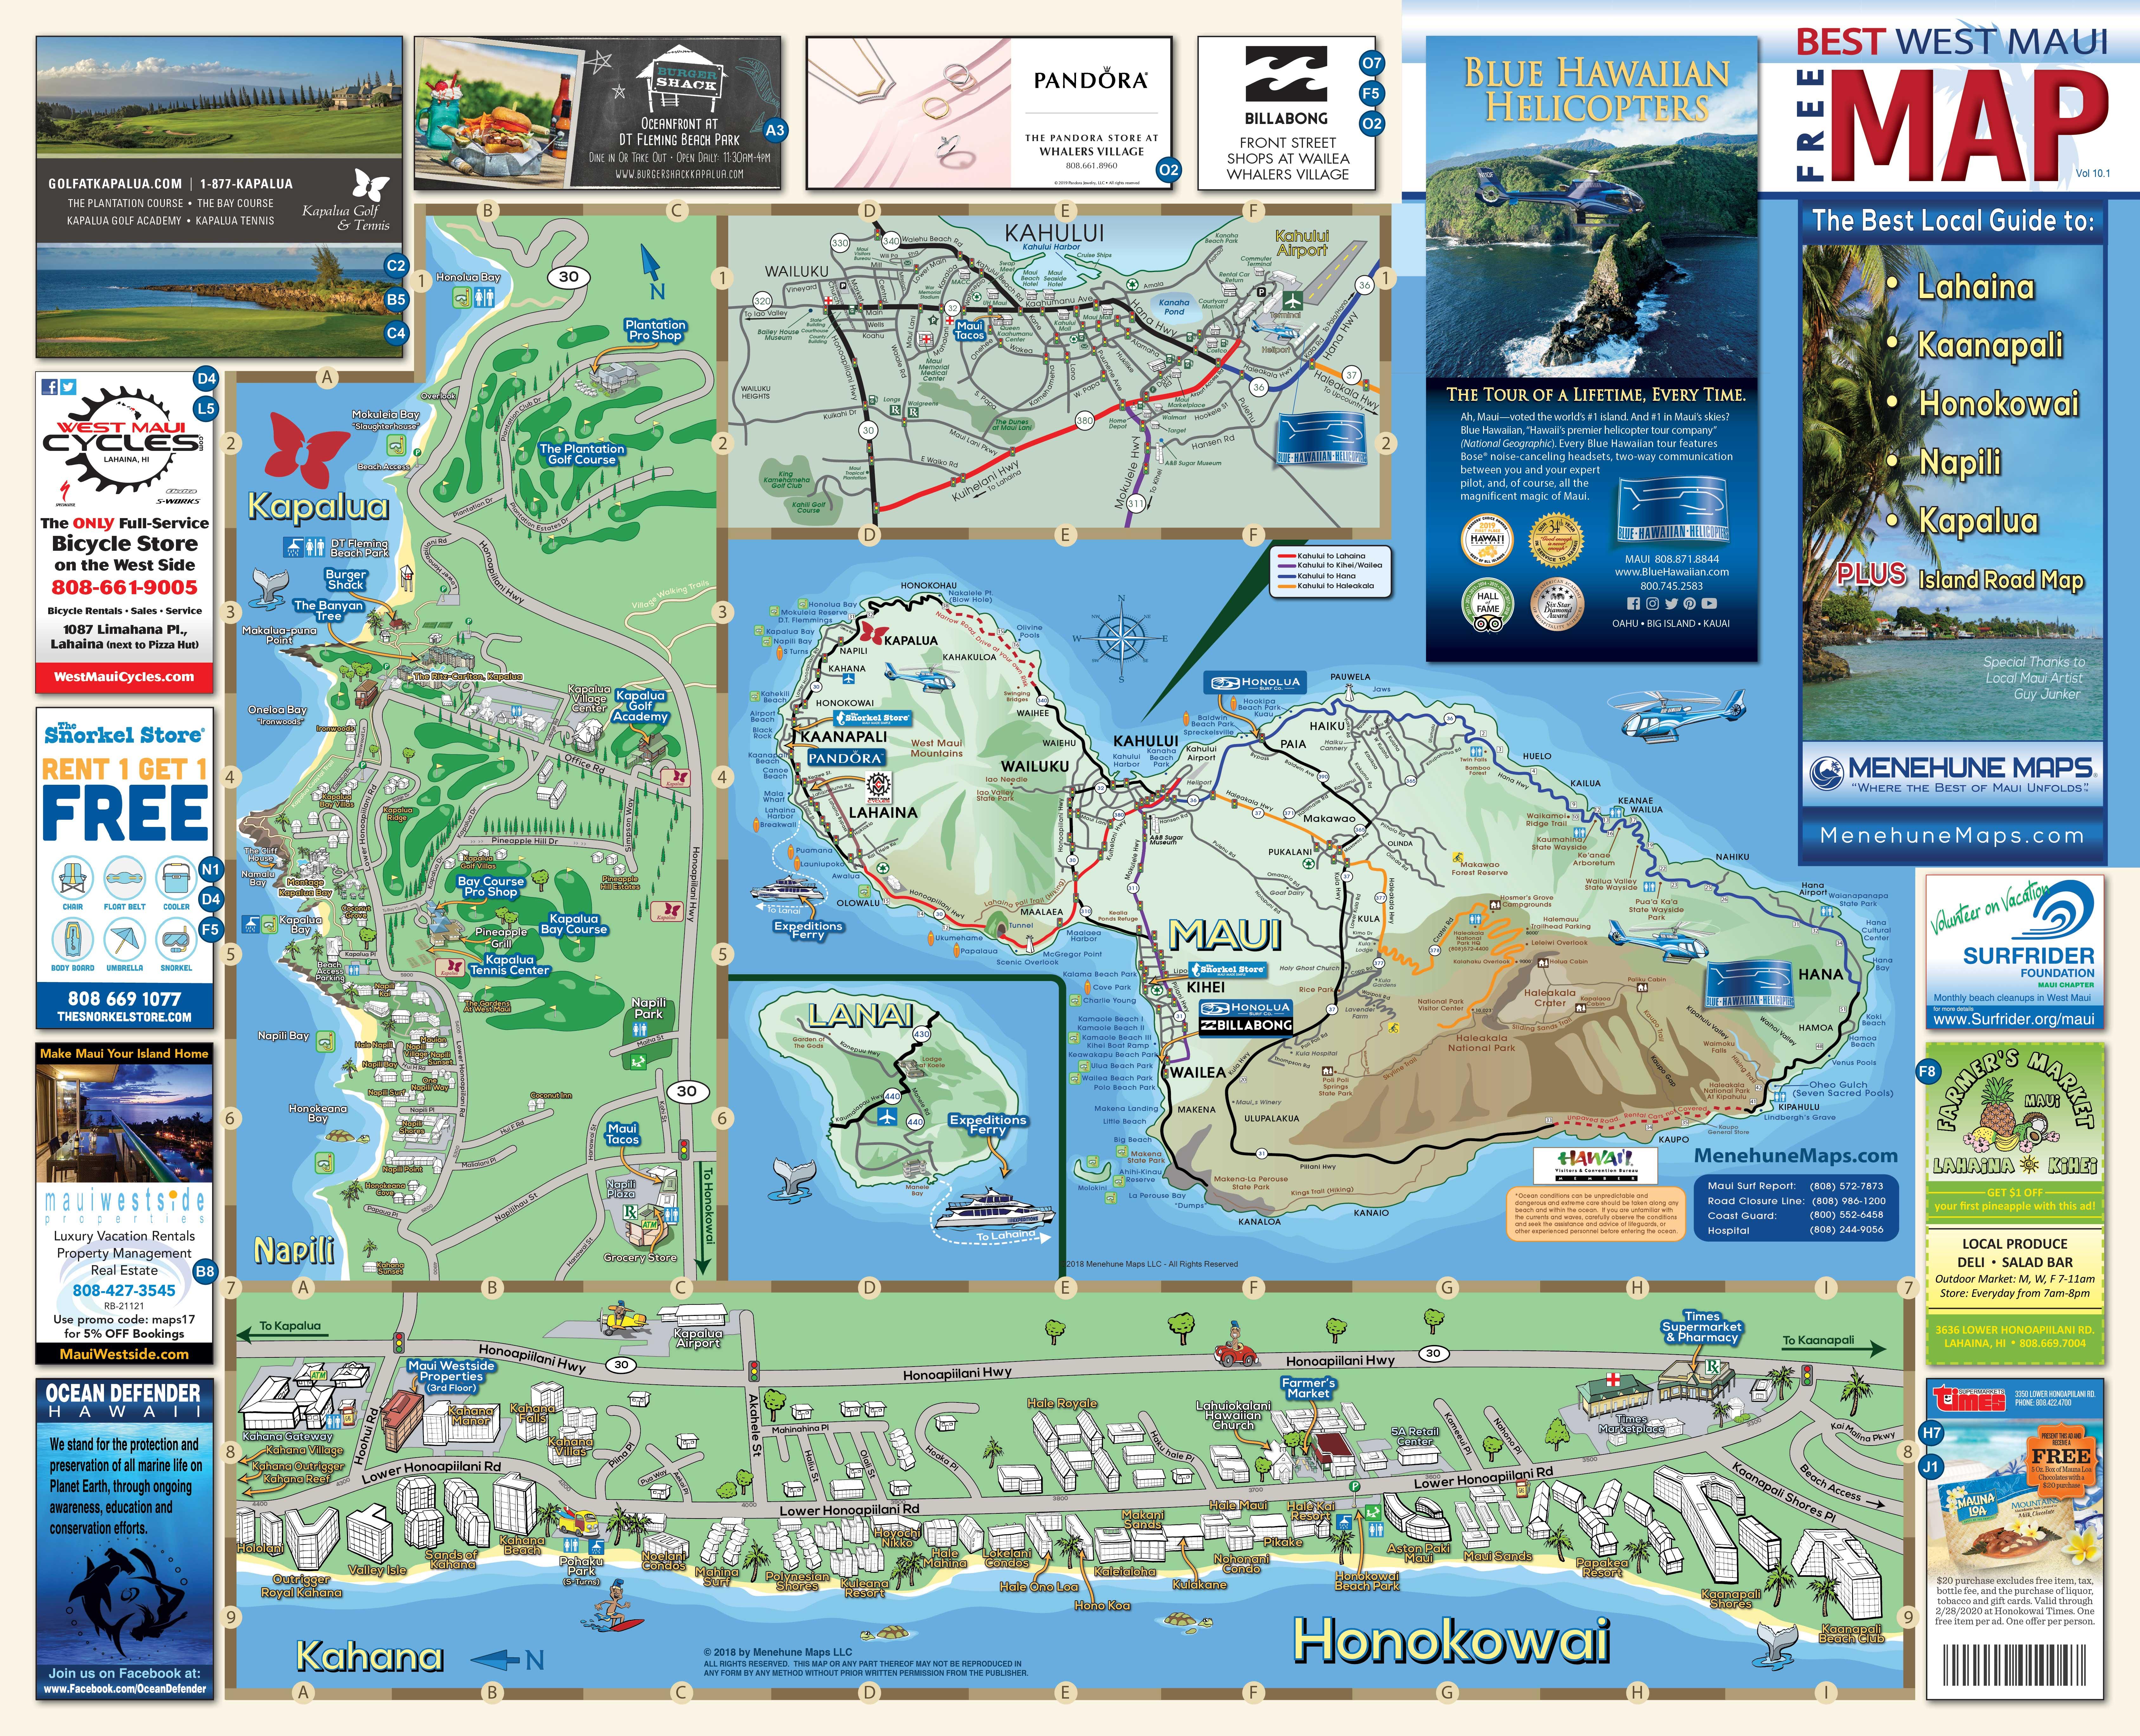 West Maui Map | Menehune Maps Map Maui on waikiki map, lahaina map, molokai map, reno map, puerto rico map, oahu map, kapalua map, miami map, lihue map, makawao map, kaanapali map, kihei map, hawaii map, pearl harbor map, kauai map, big island map, honolulu map, hawaiian islands map, lanai map, florida map,